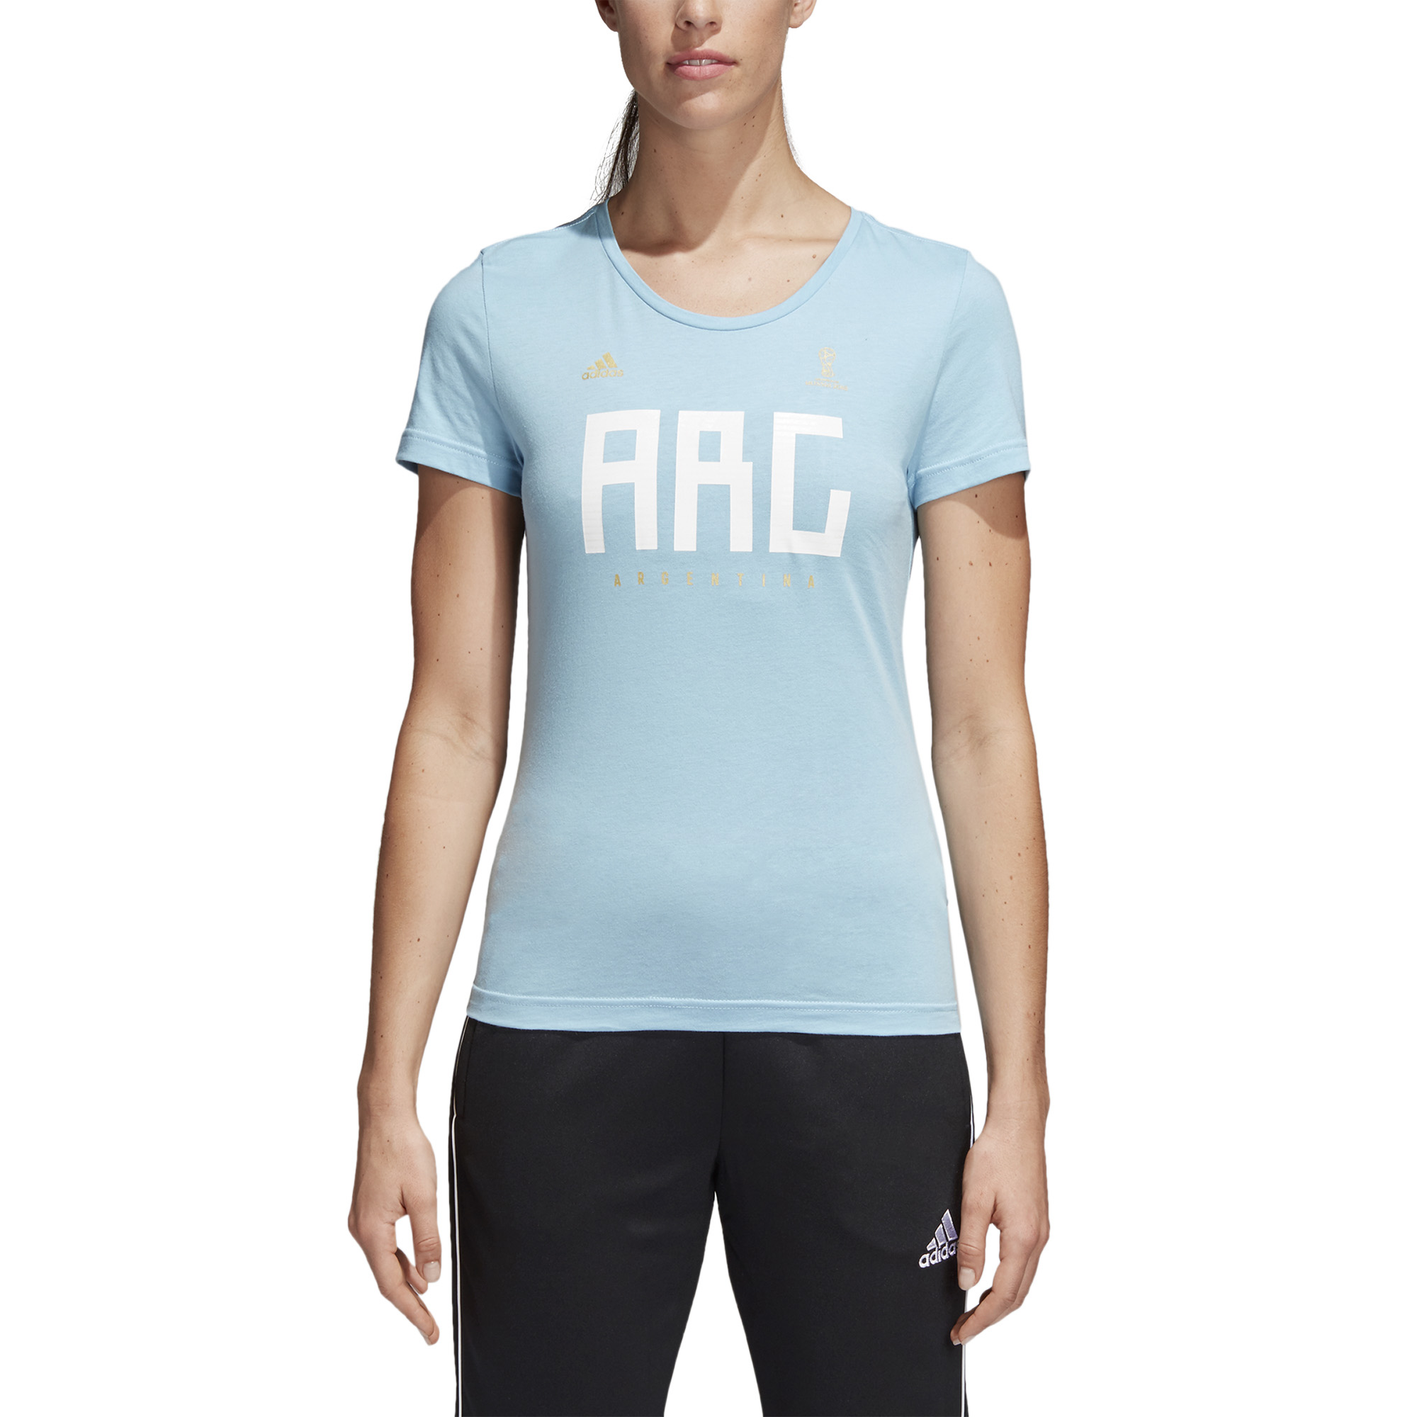 3eb261bdc20 Womens Soccer Team T Shirts - DREAMWORKS